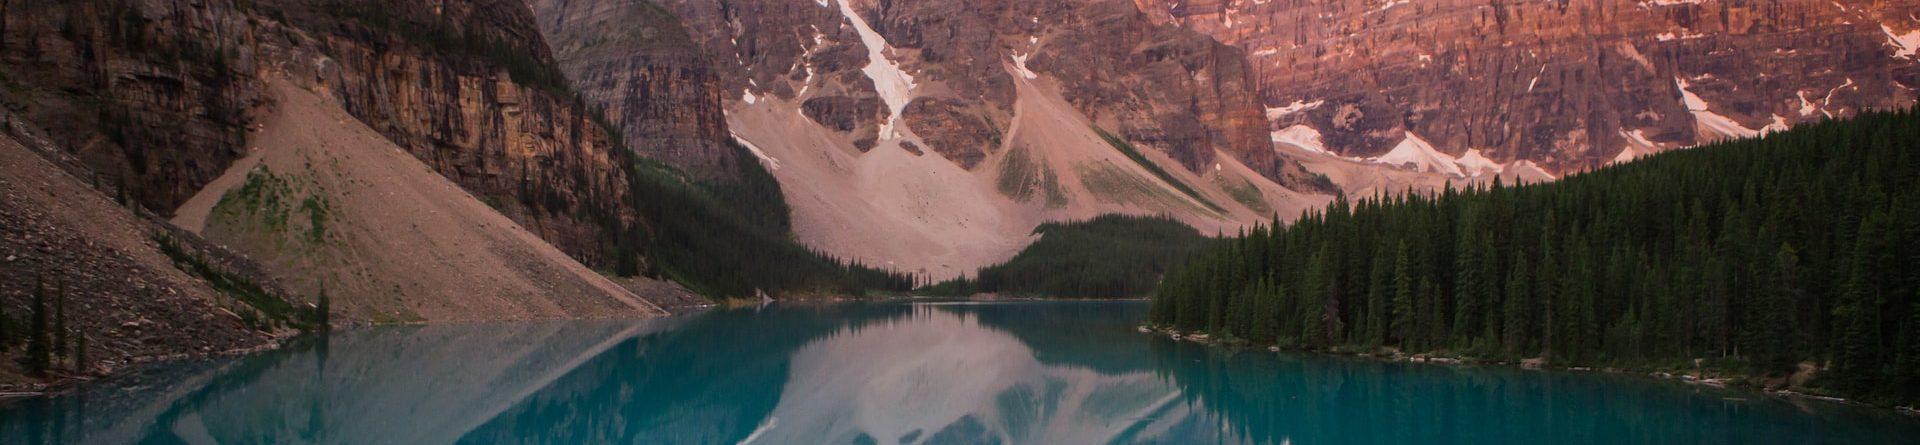 Учеба и переезд в Канаду вместе с Kiwi Education